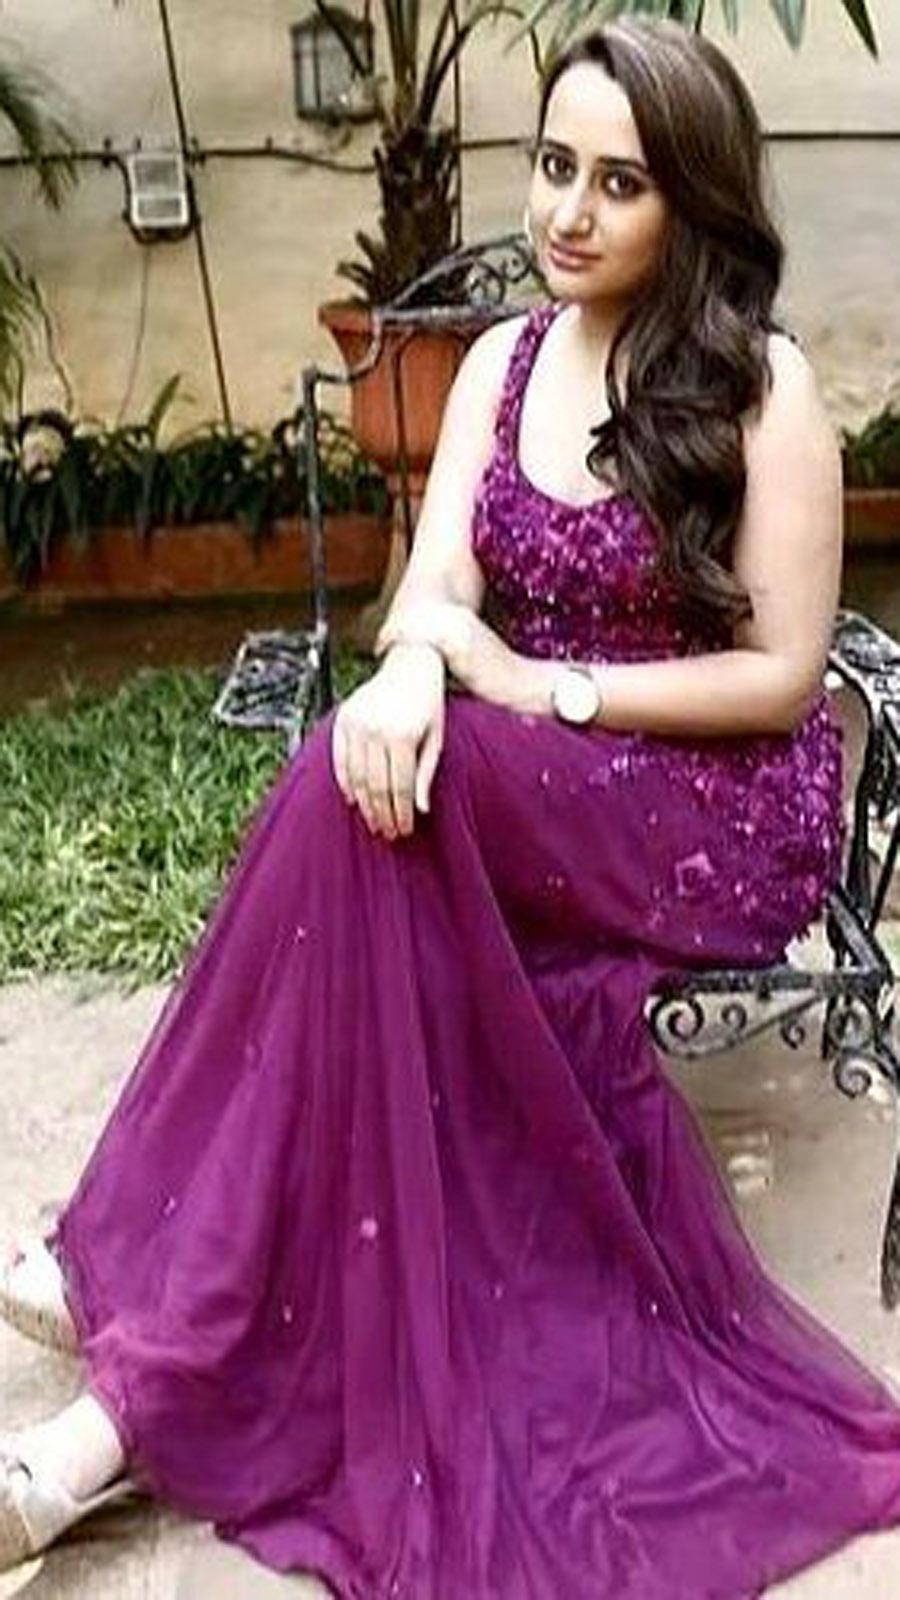 Natasha Dalal rocks the desi look